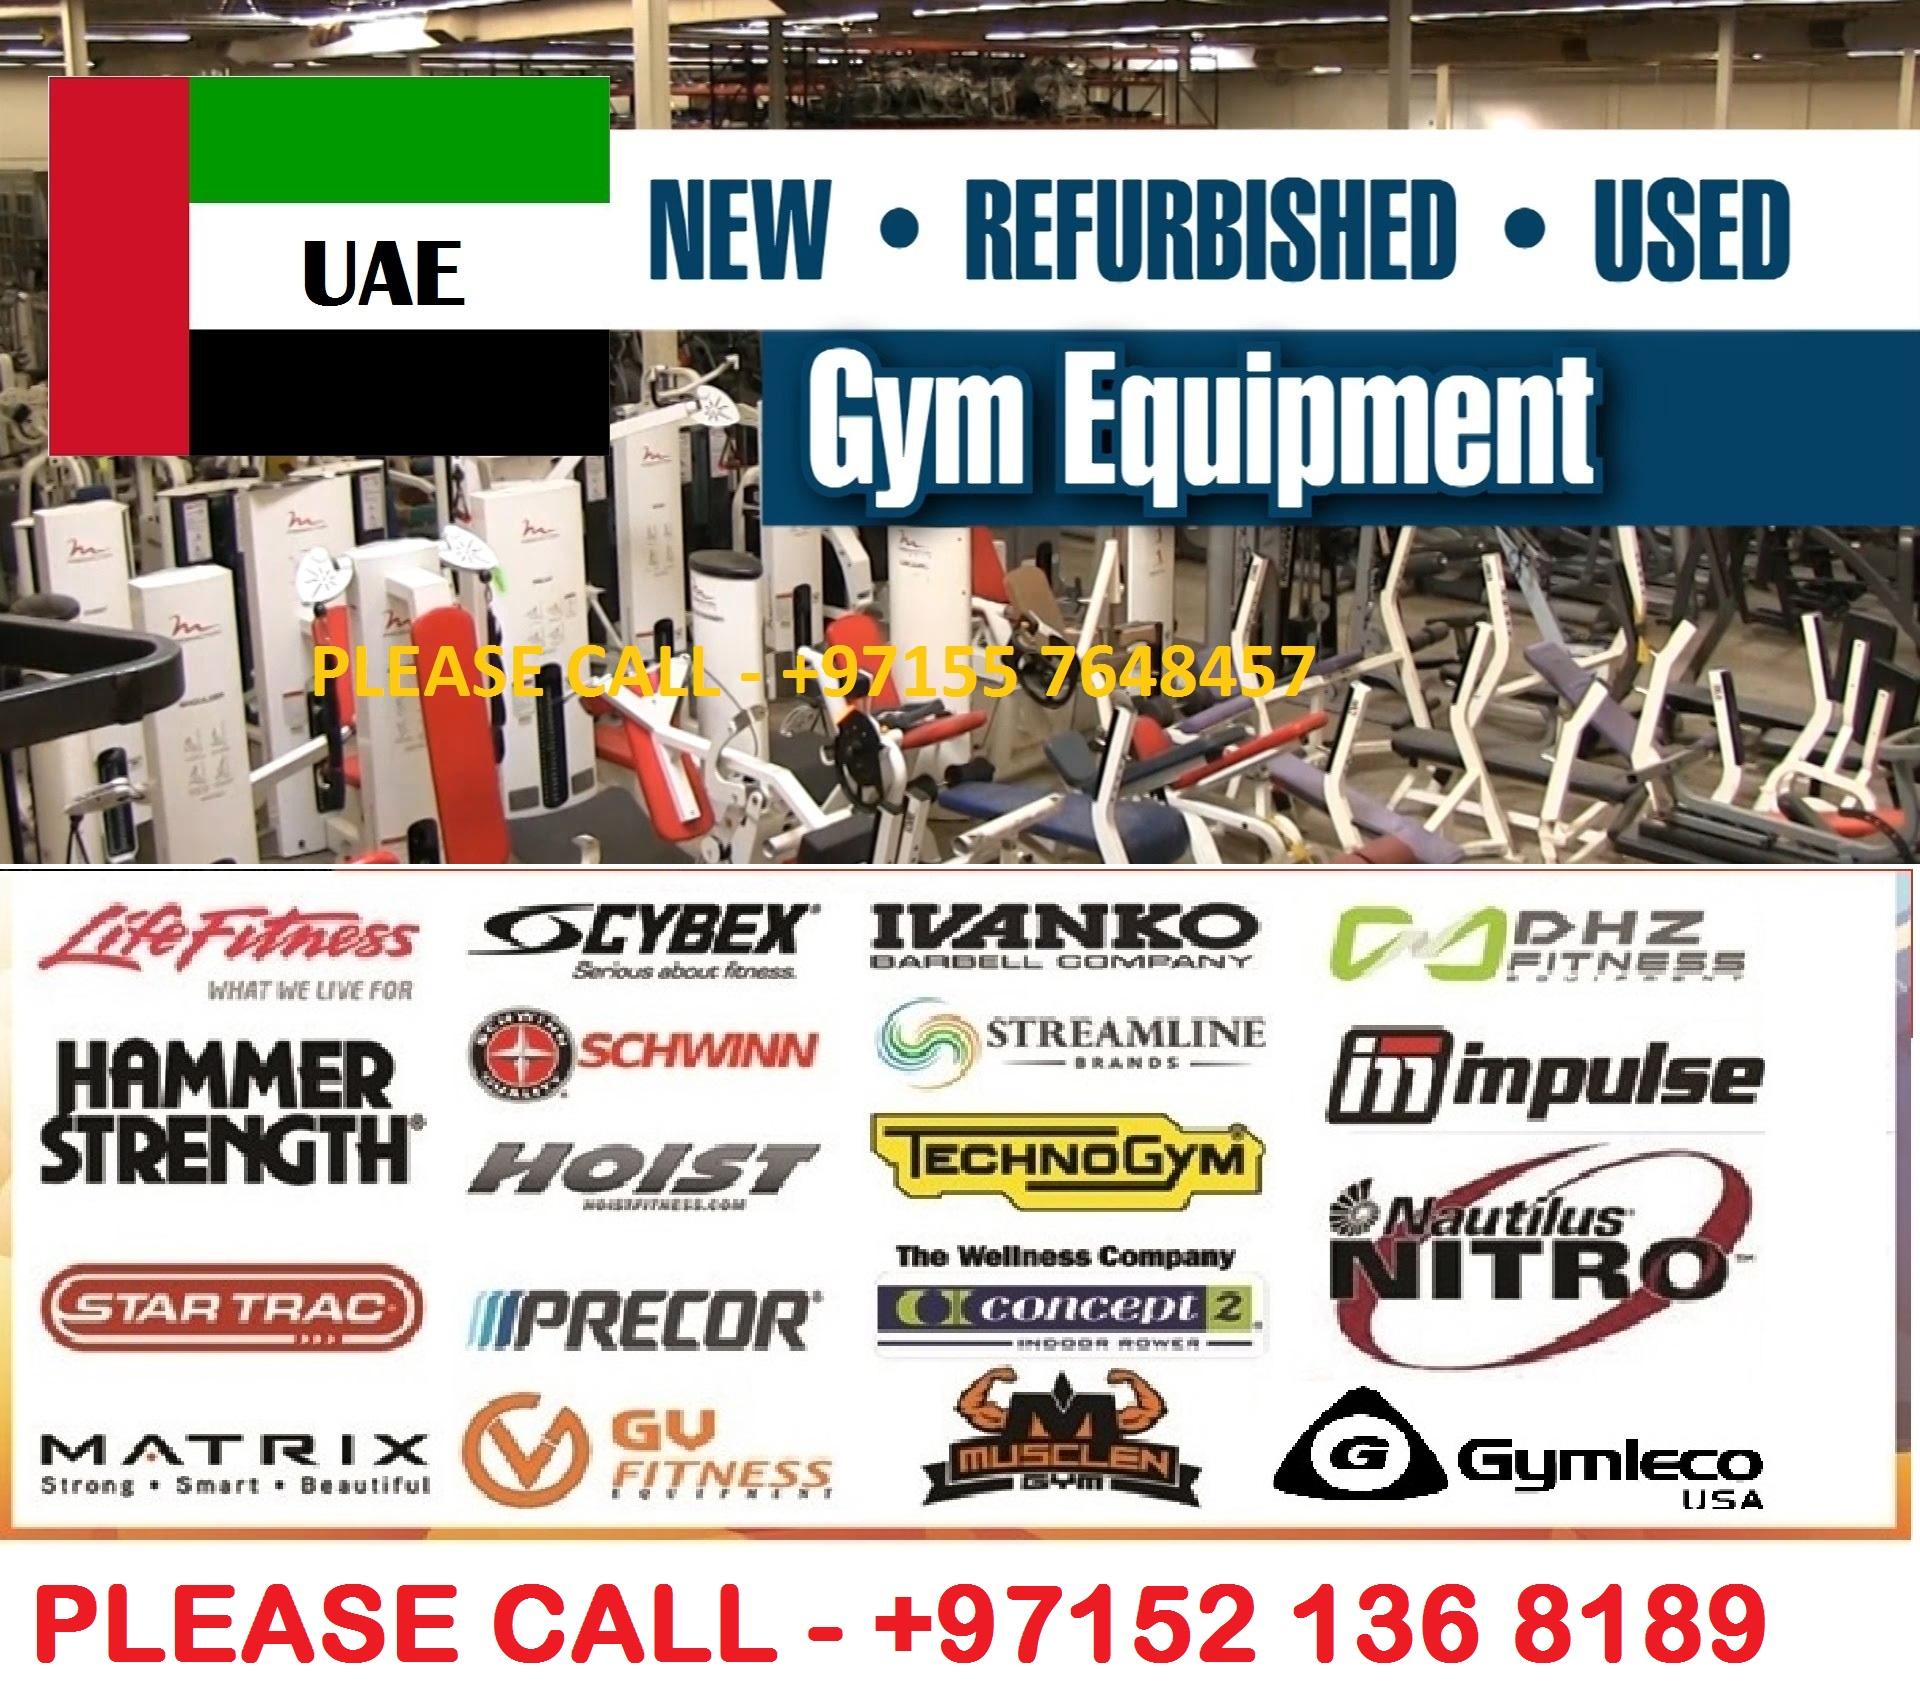 UAE LARGE EQUIPMENT SHOWROOM 2.jpg